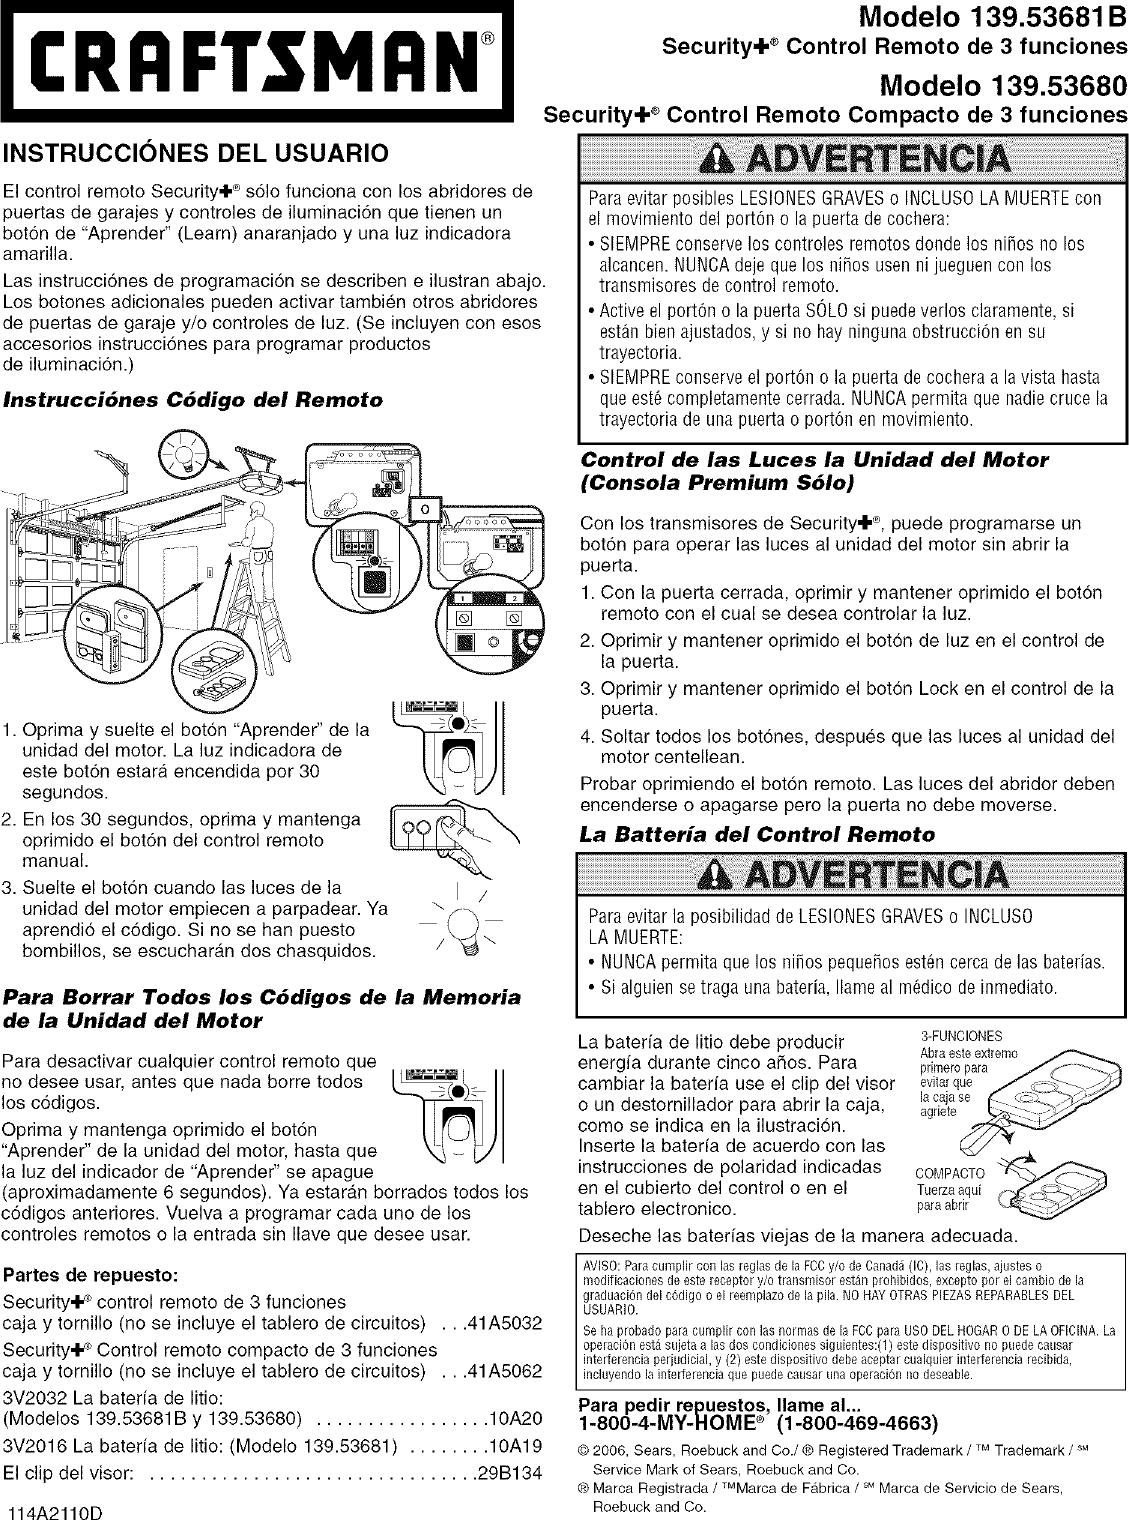 Craftsman 13953680 User Manual Garage Door Opener Manuals And Guides